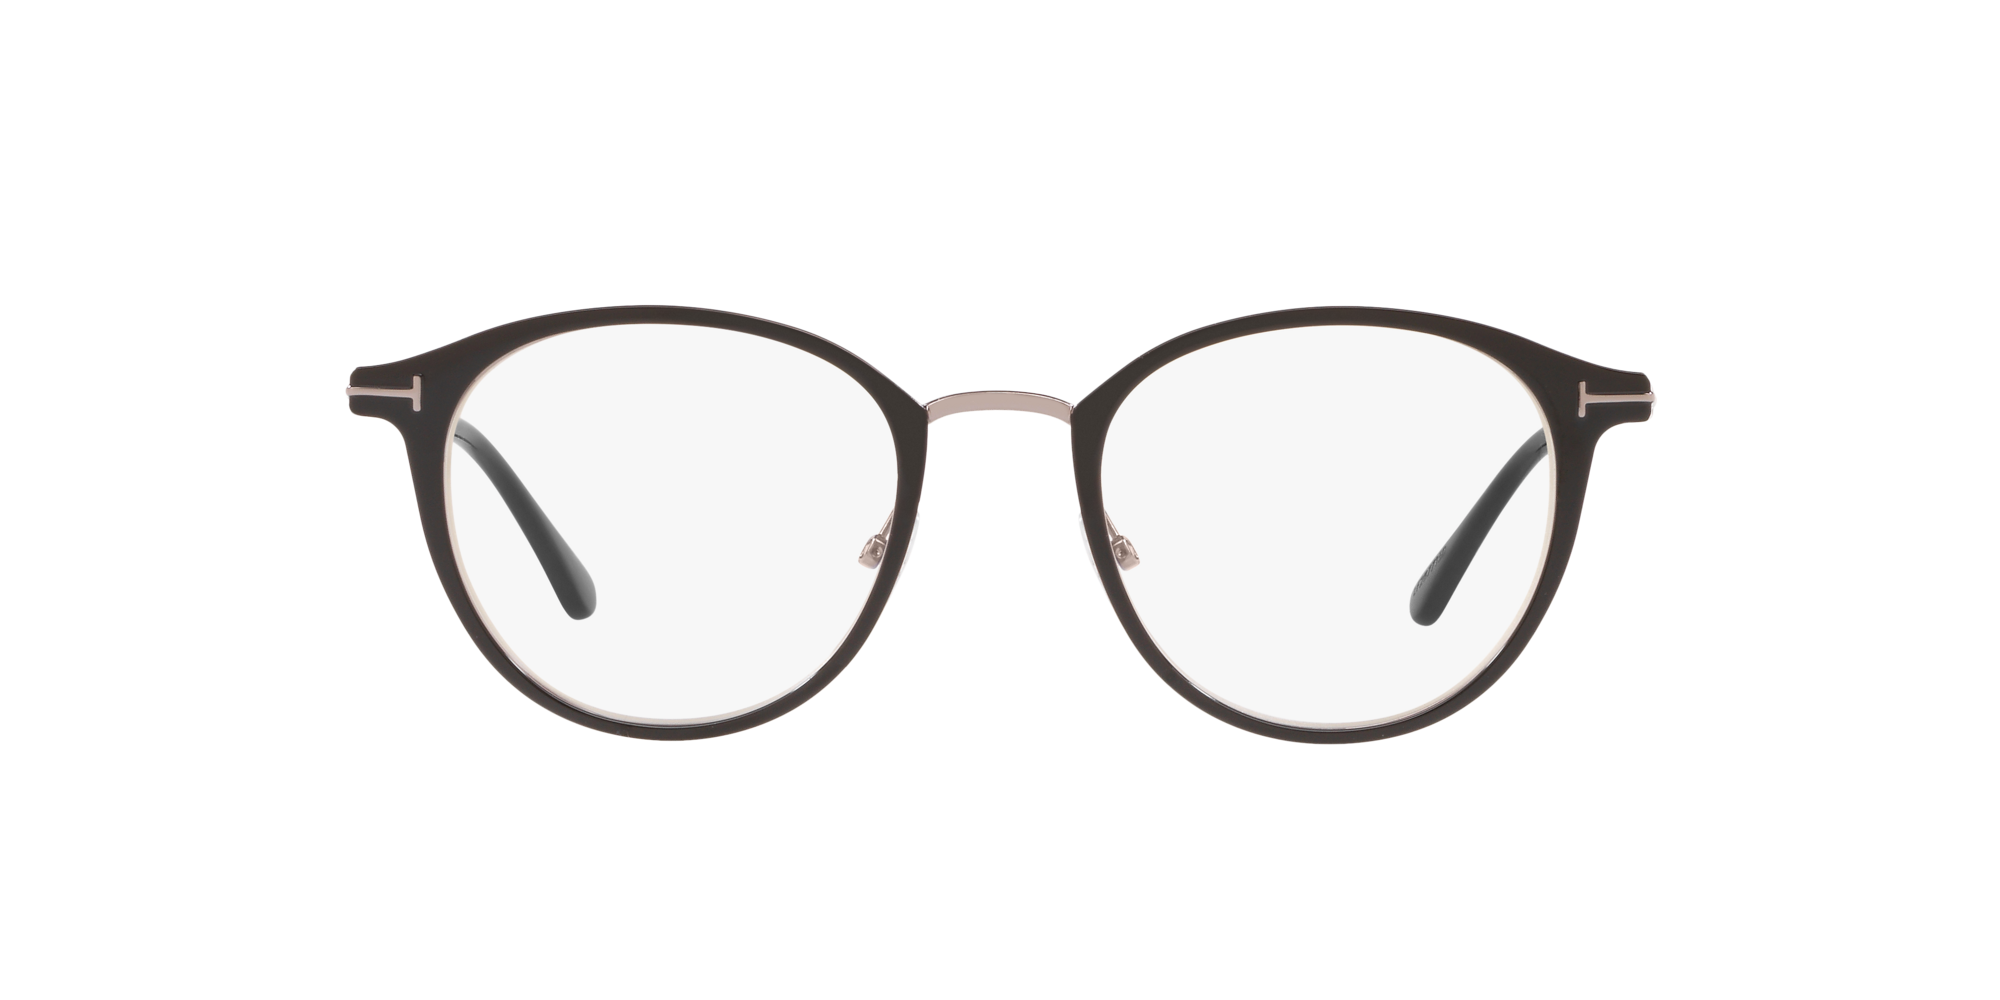 Image for FT5528-B from LensCrafters | Glasses, Prescription Glasses Online, Eyewear